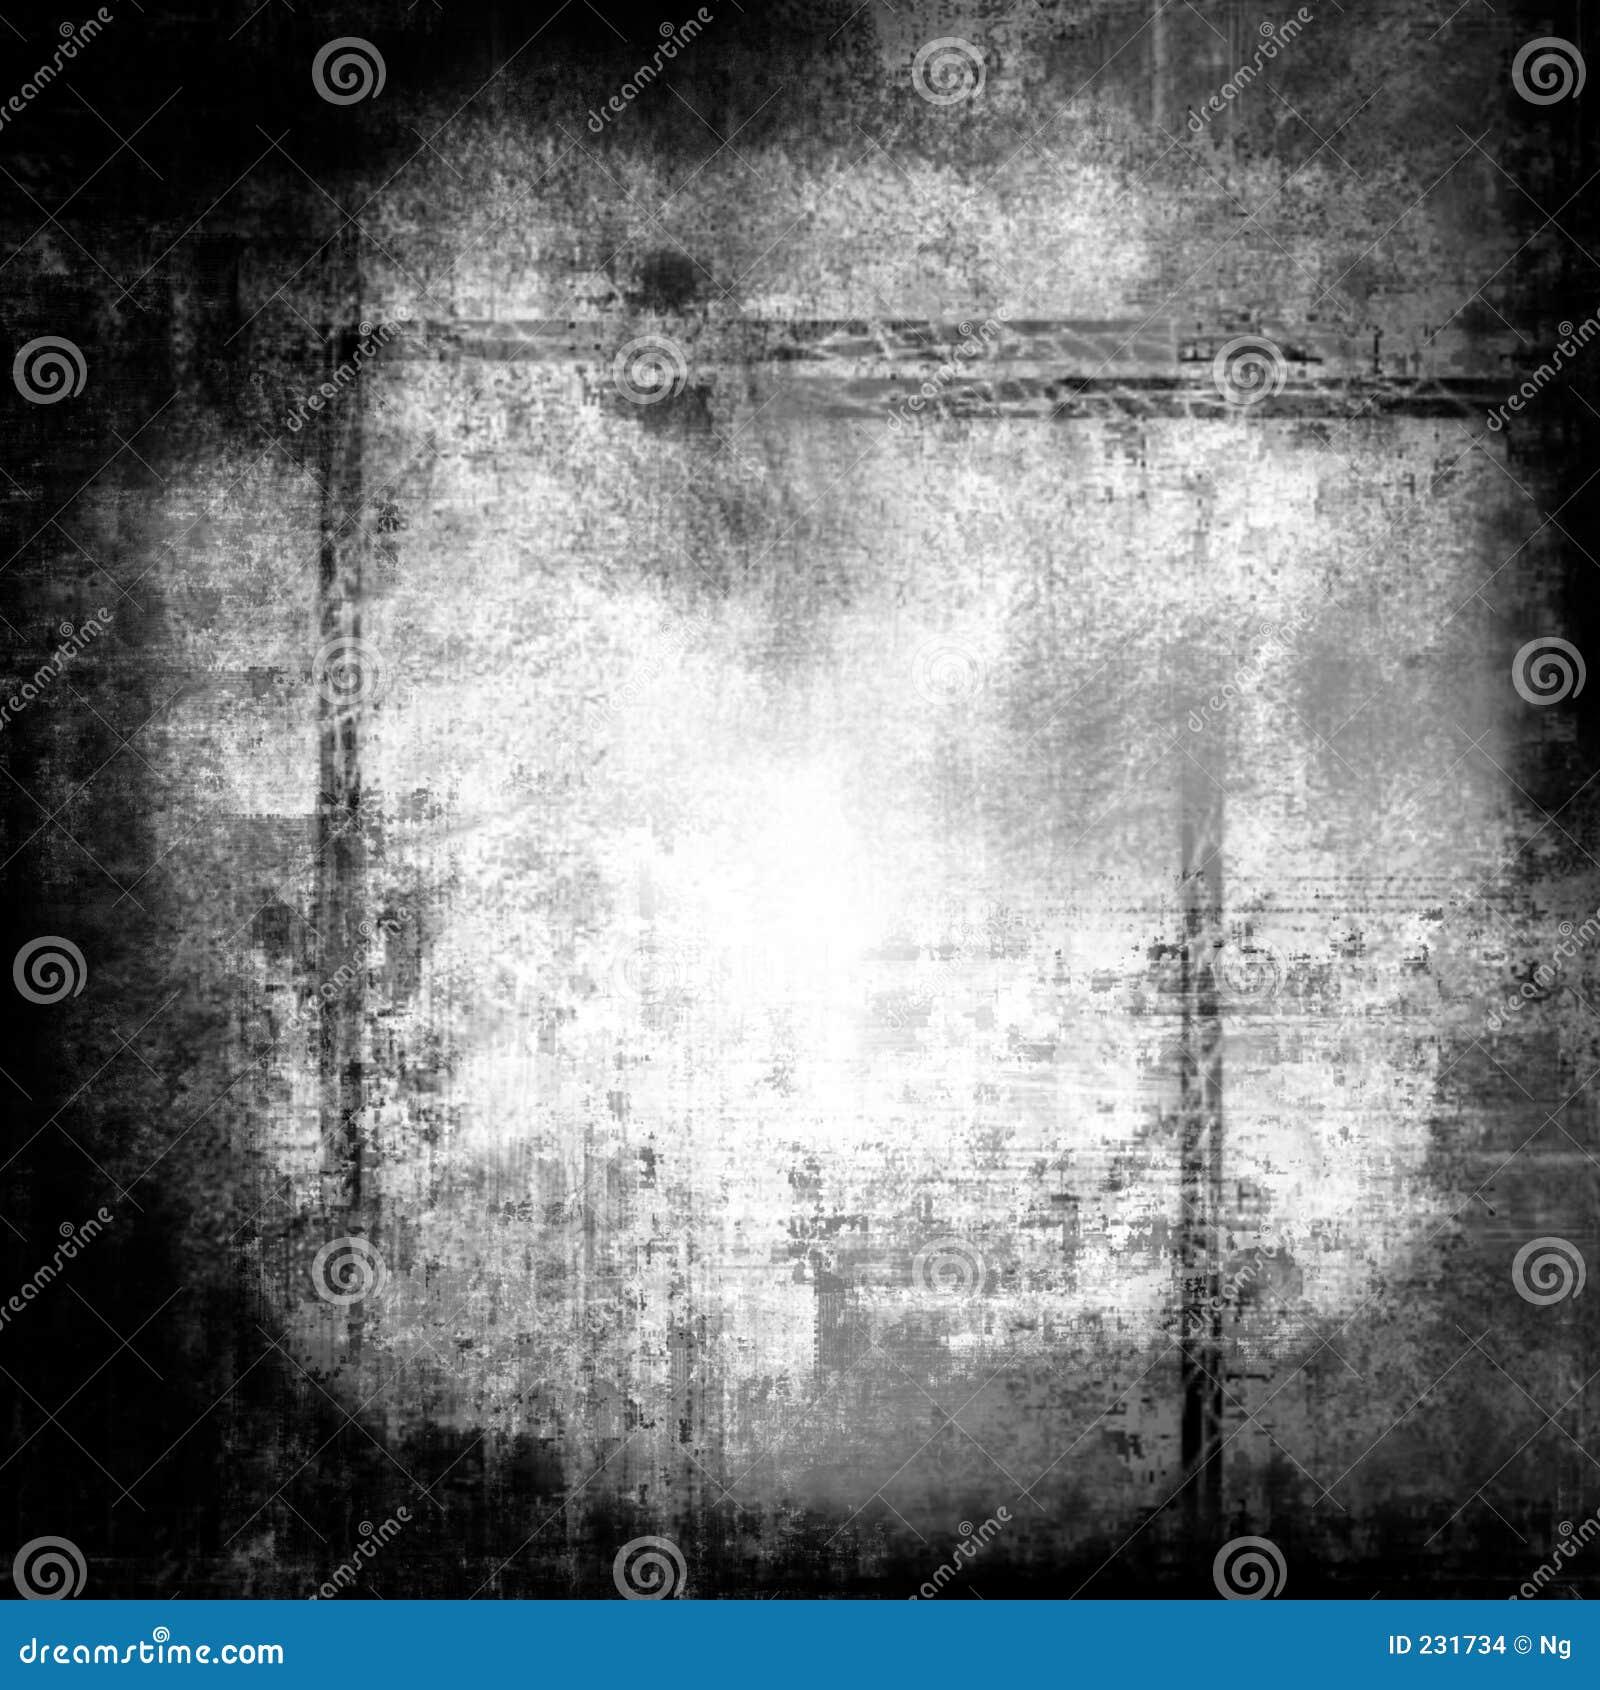 Grunge Pattern Stock Images - Image: 231734